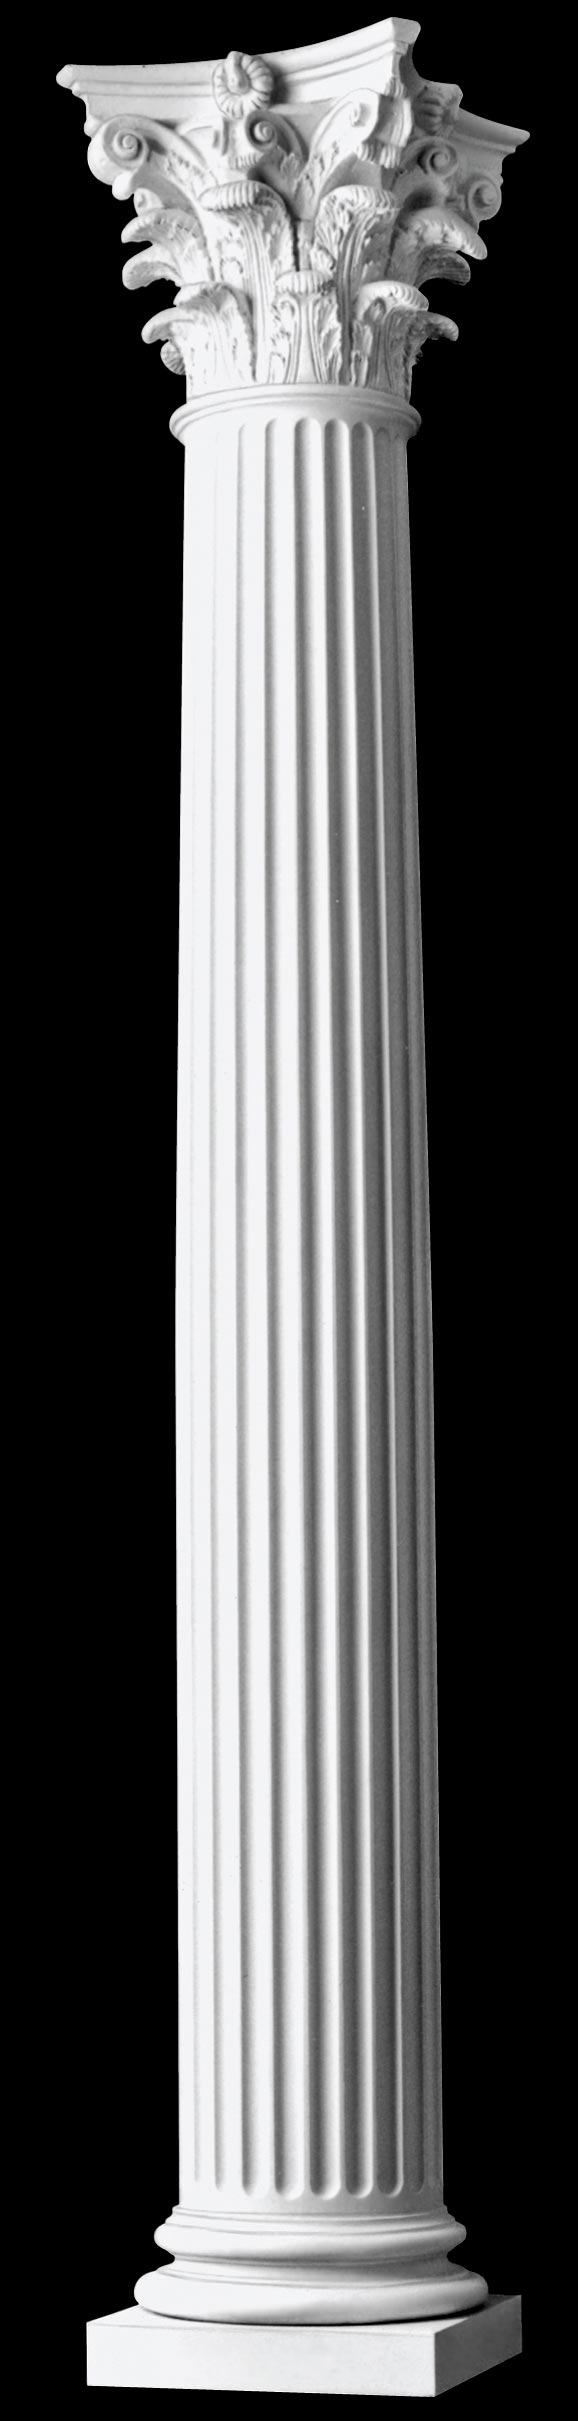 Architectural columns fluted roman corinthian wood columns for Columns designs